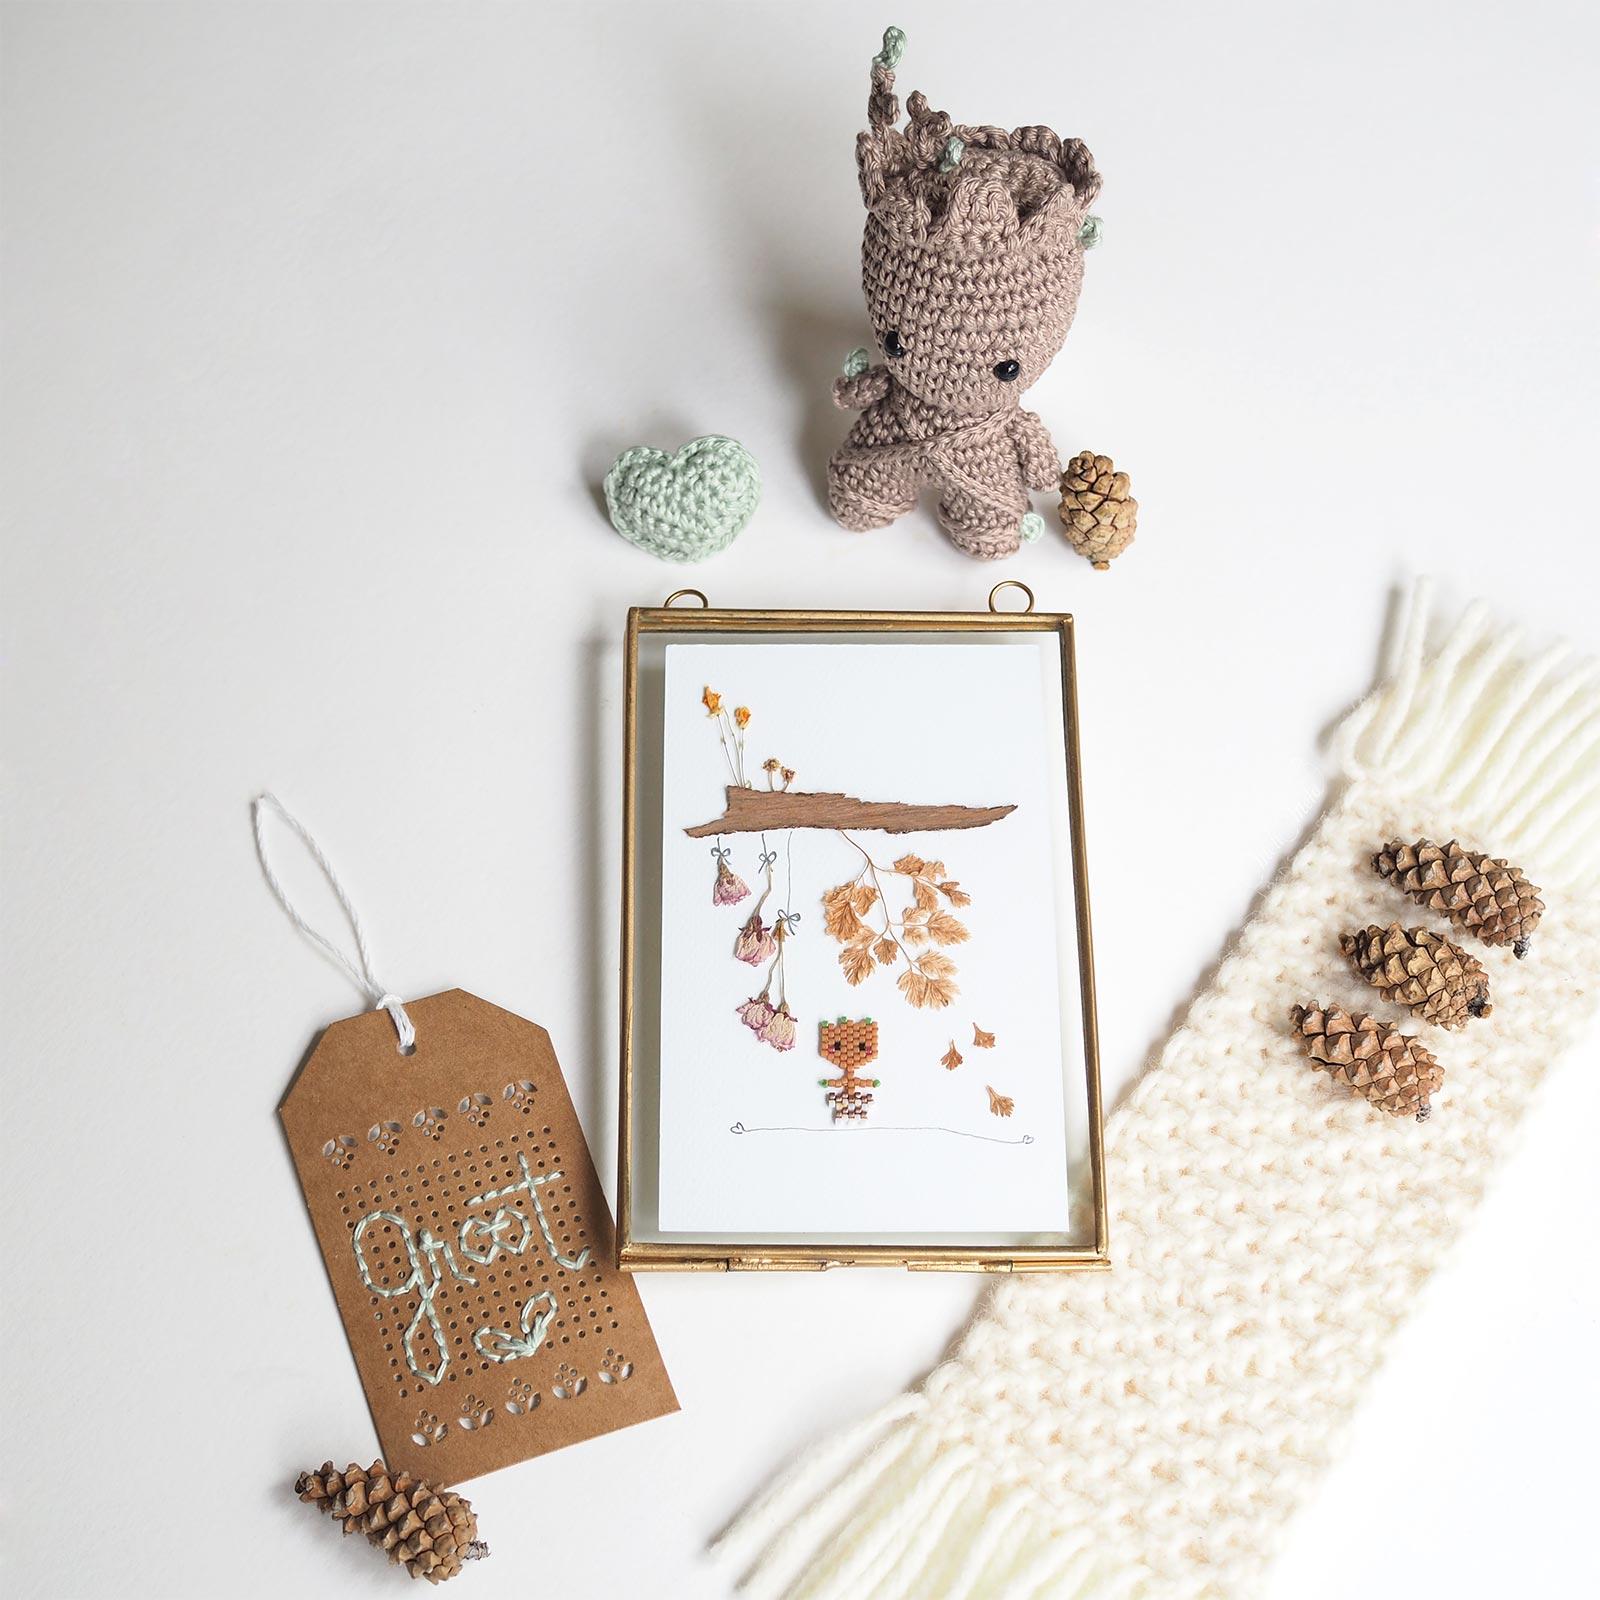 baby groot marvel crochet coeur affiche fleurs naturelles perles miyuki teaforyoubijoux laboutiquedemelimelo